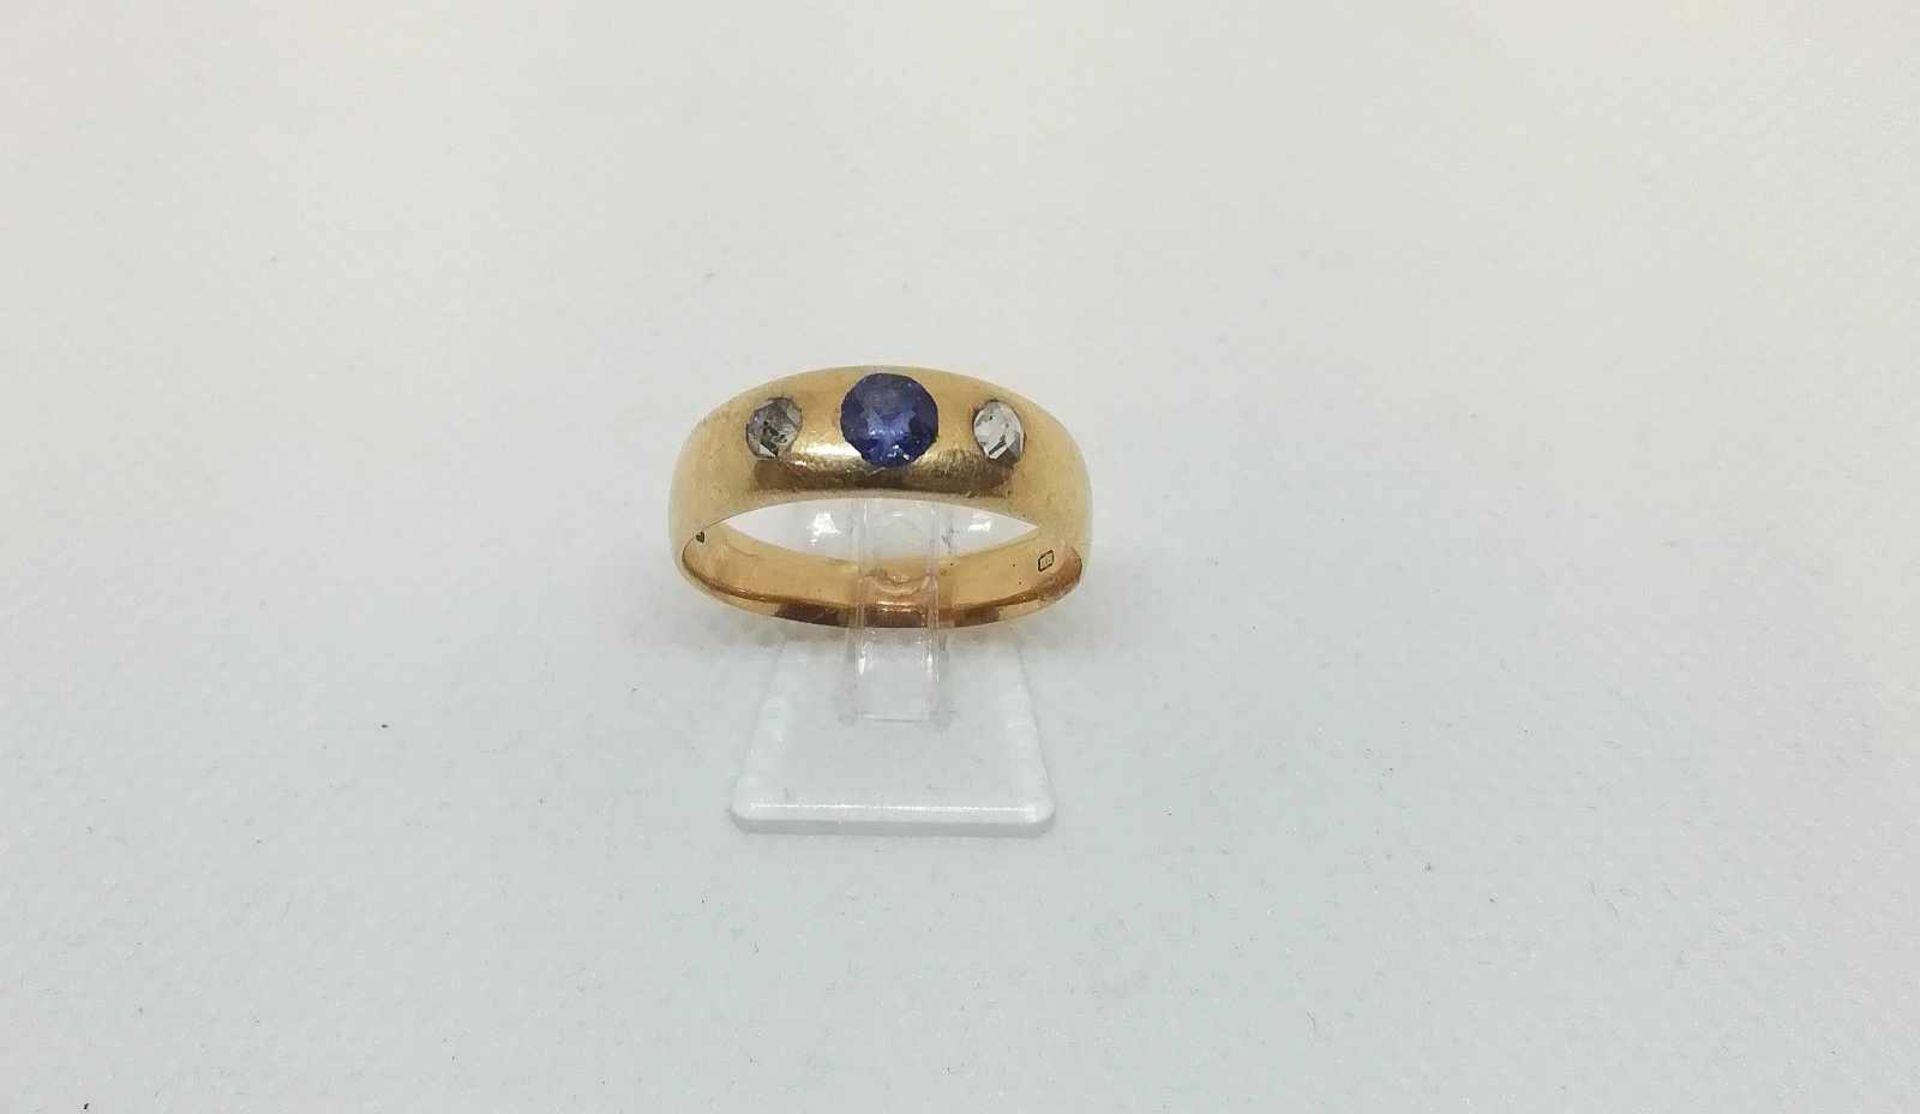 DamenringGold 585, Diamantrauten, 1 Saphir, RW 59, 5g;